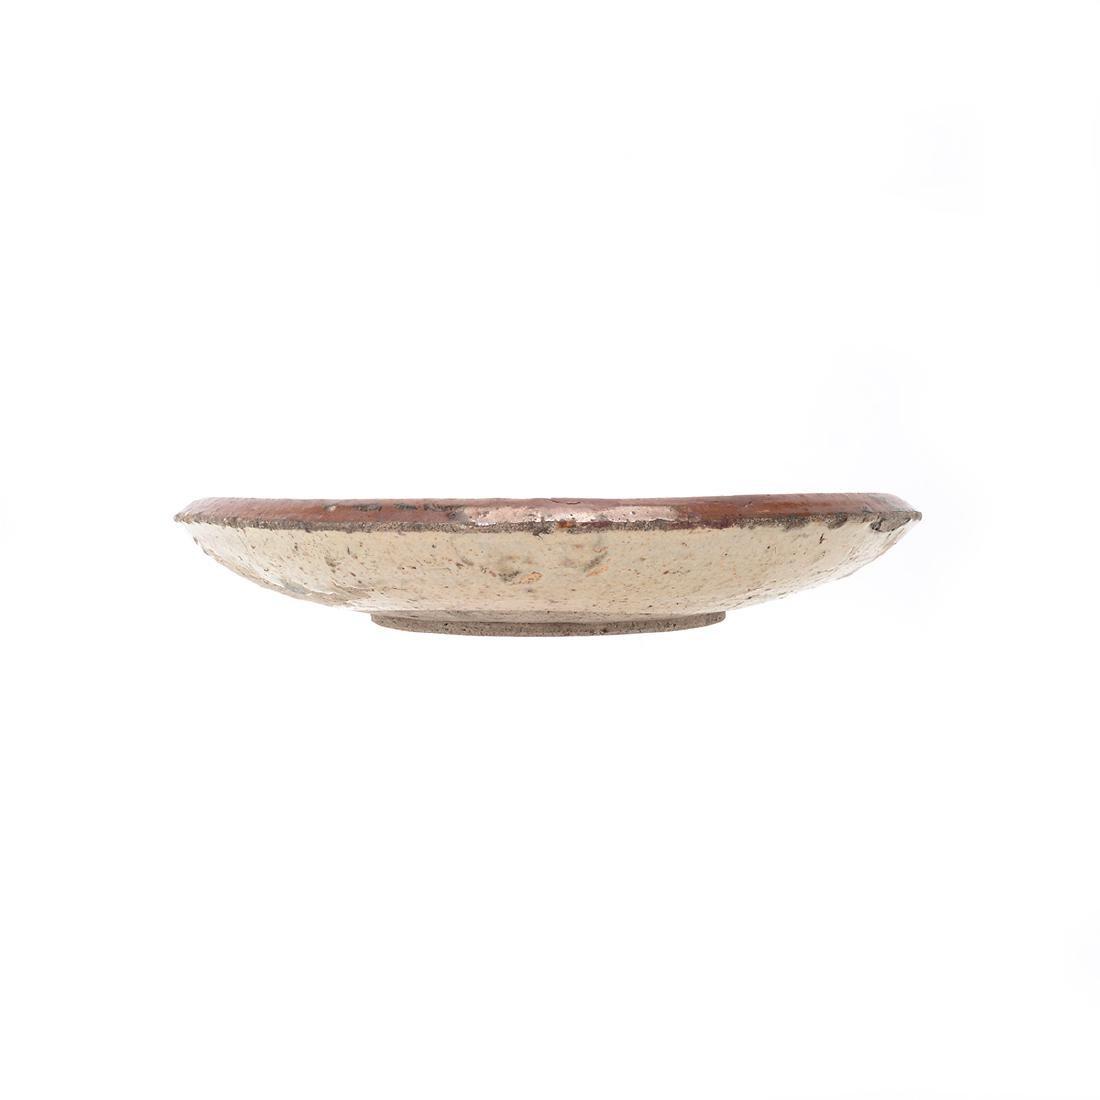 Japanese Mingei 'Horse-Eye' Dish, Edo Period - 3